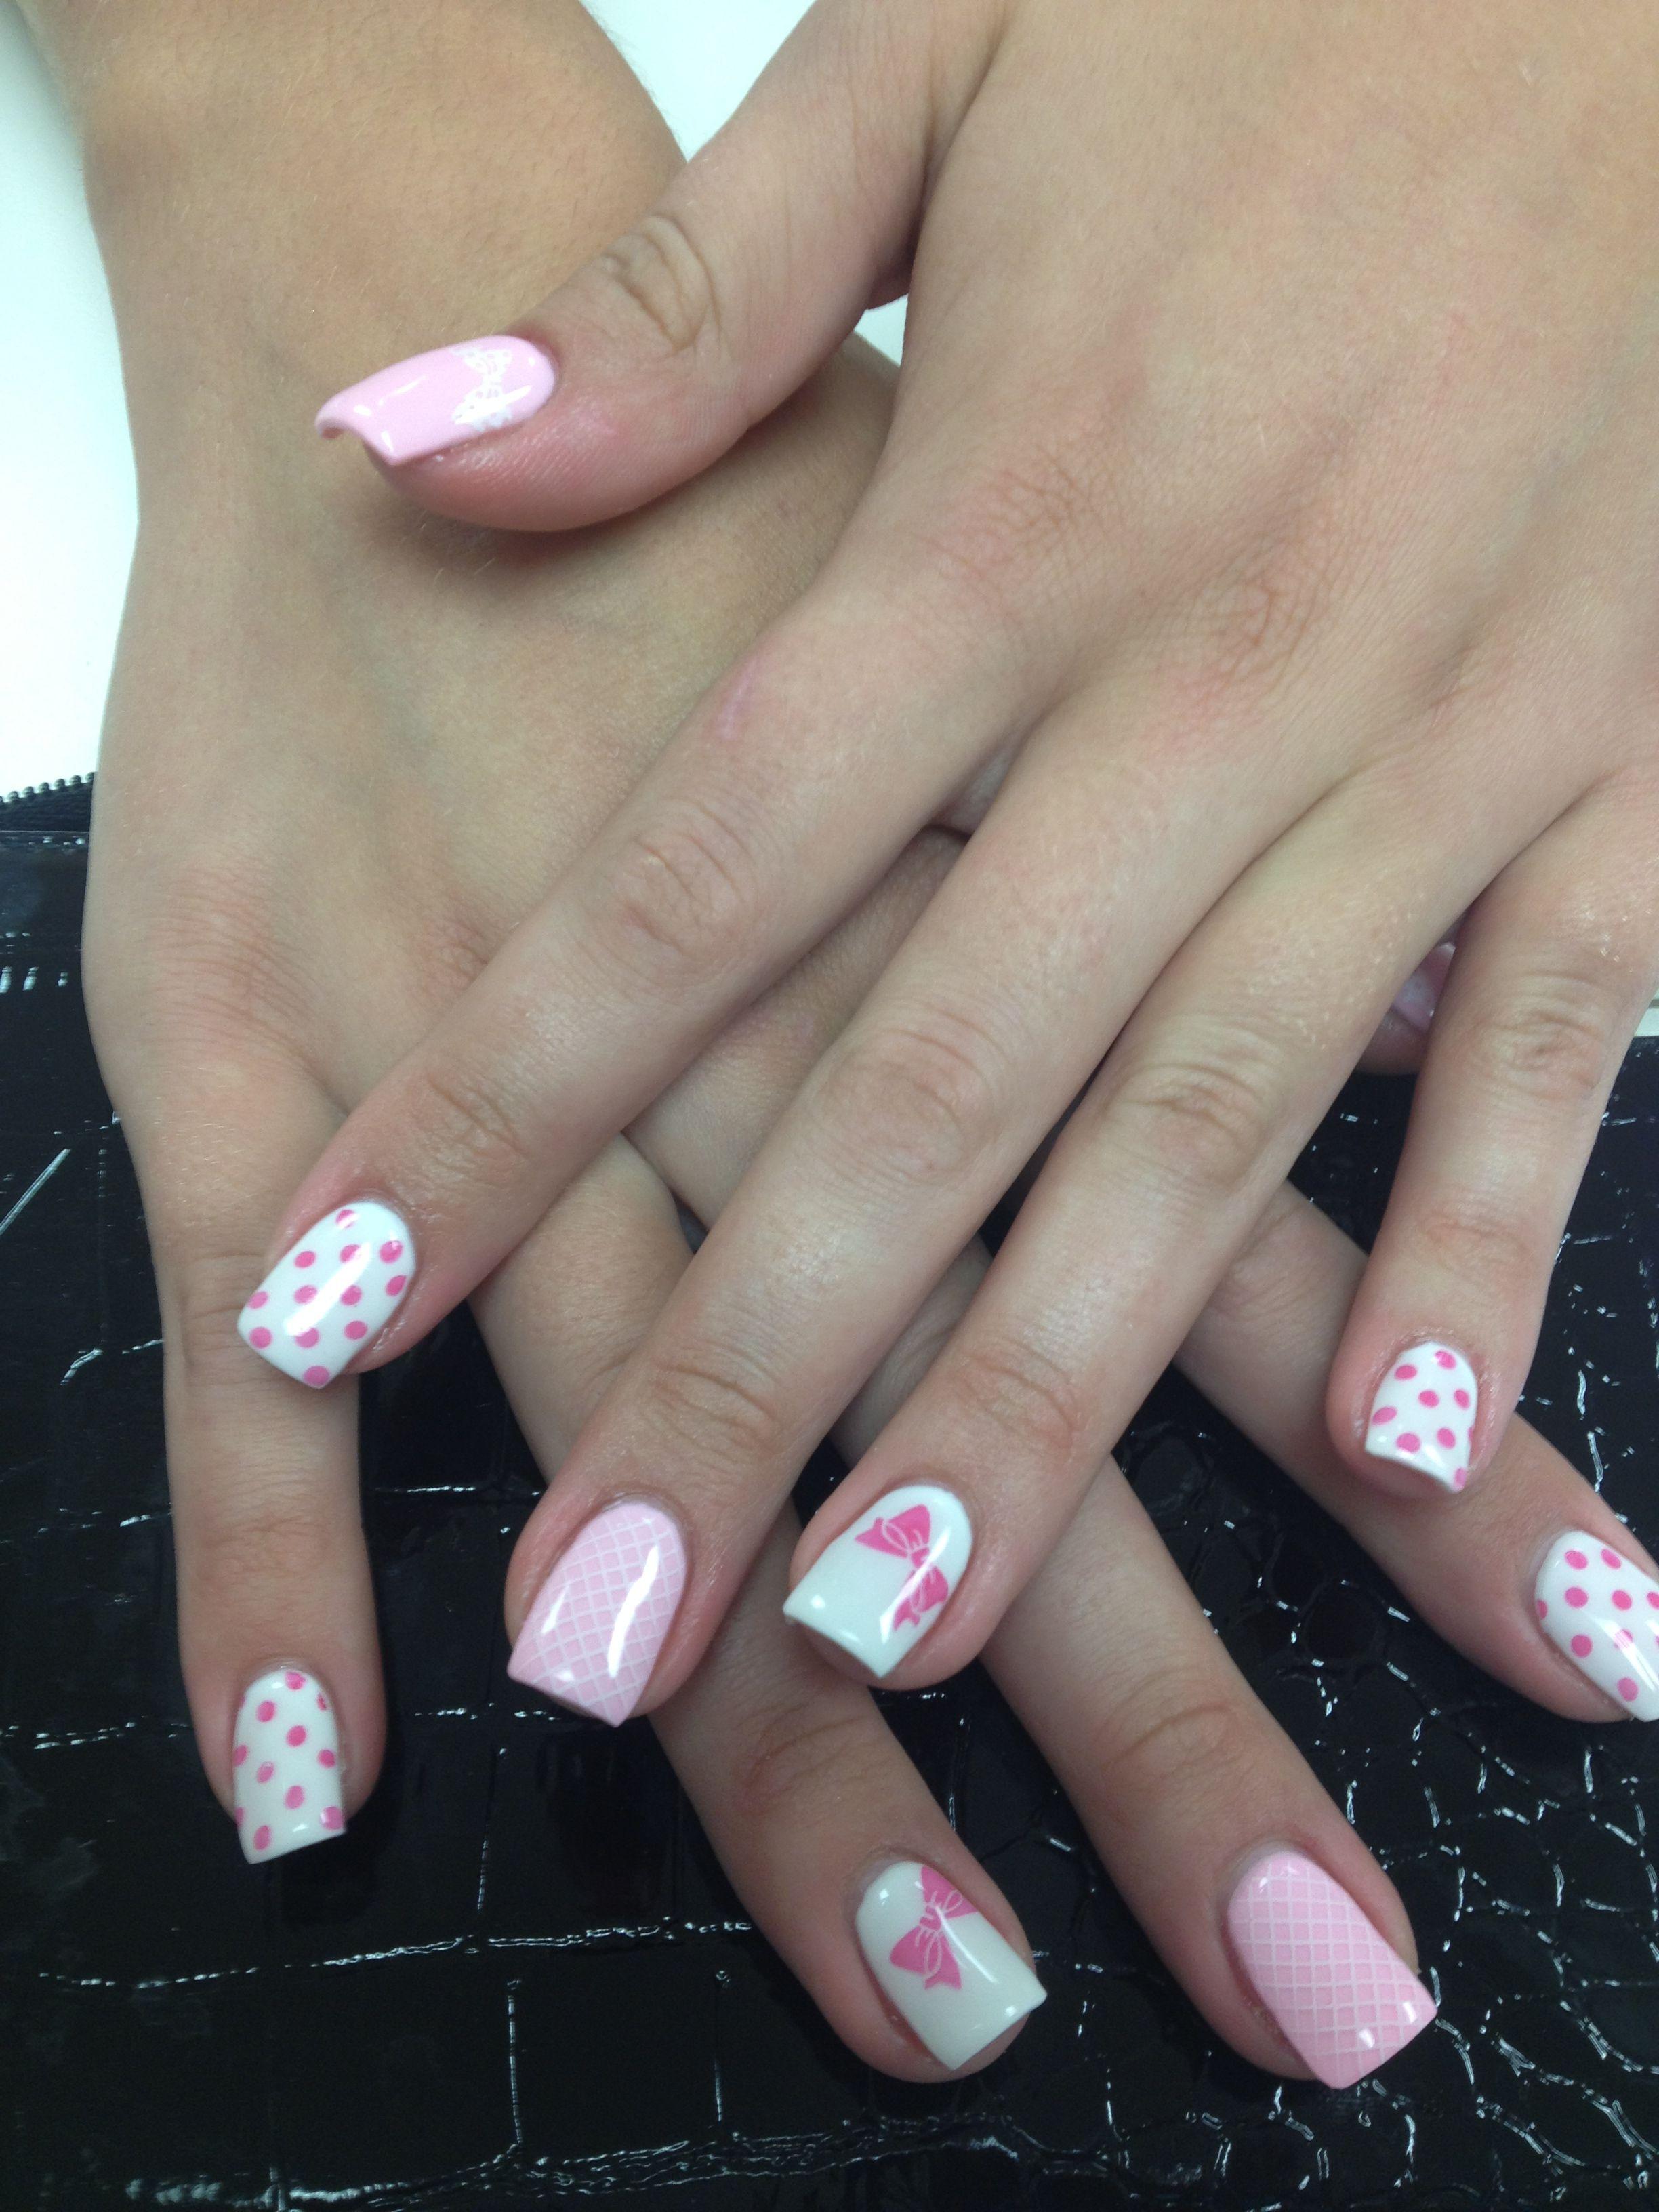 Gel nails full color   Nail ideas   Pinterest